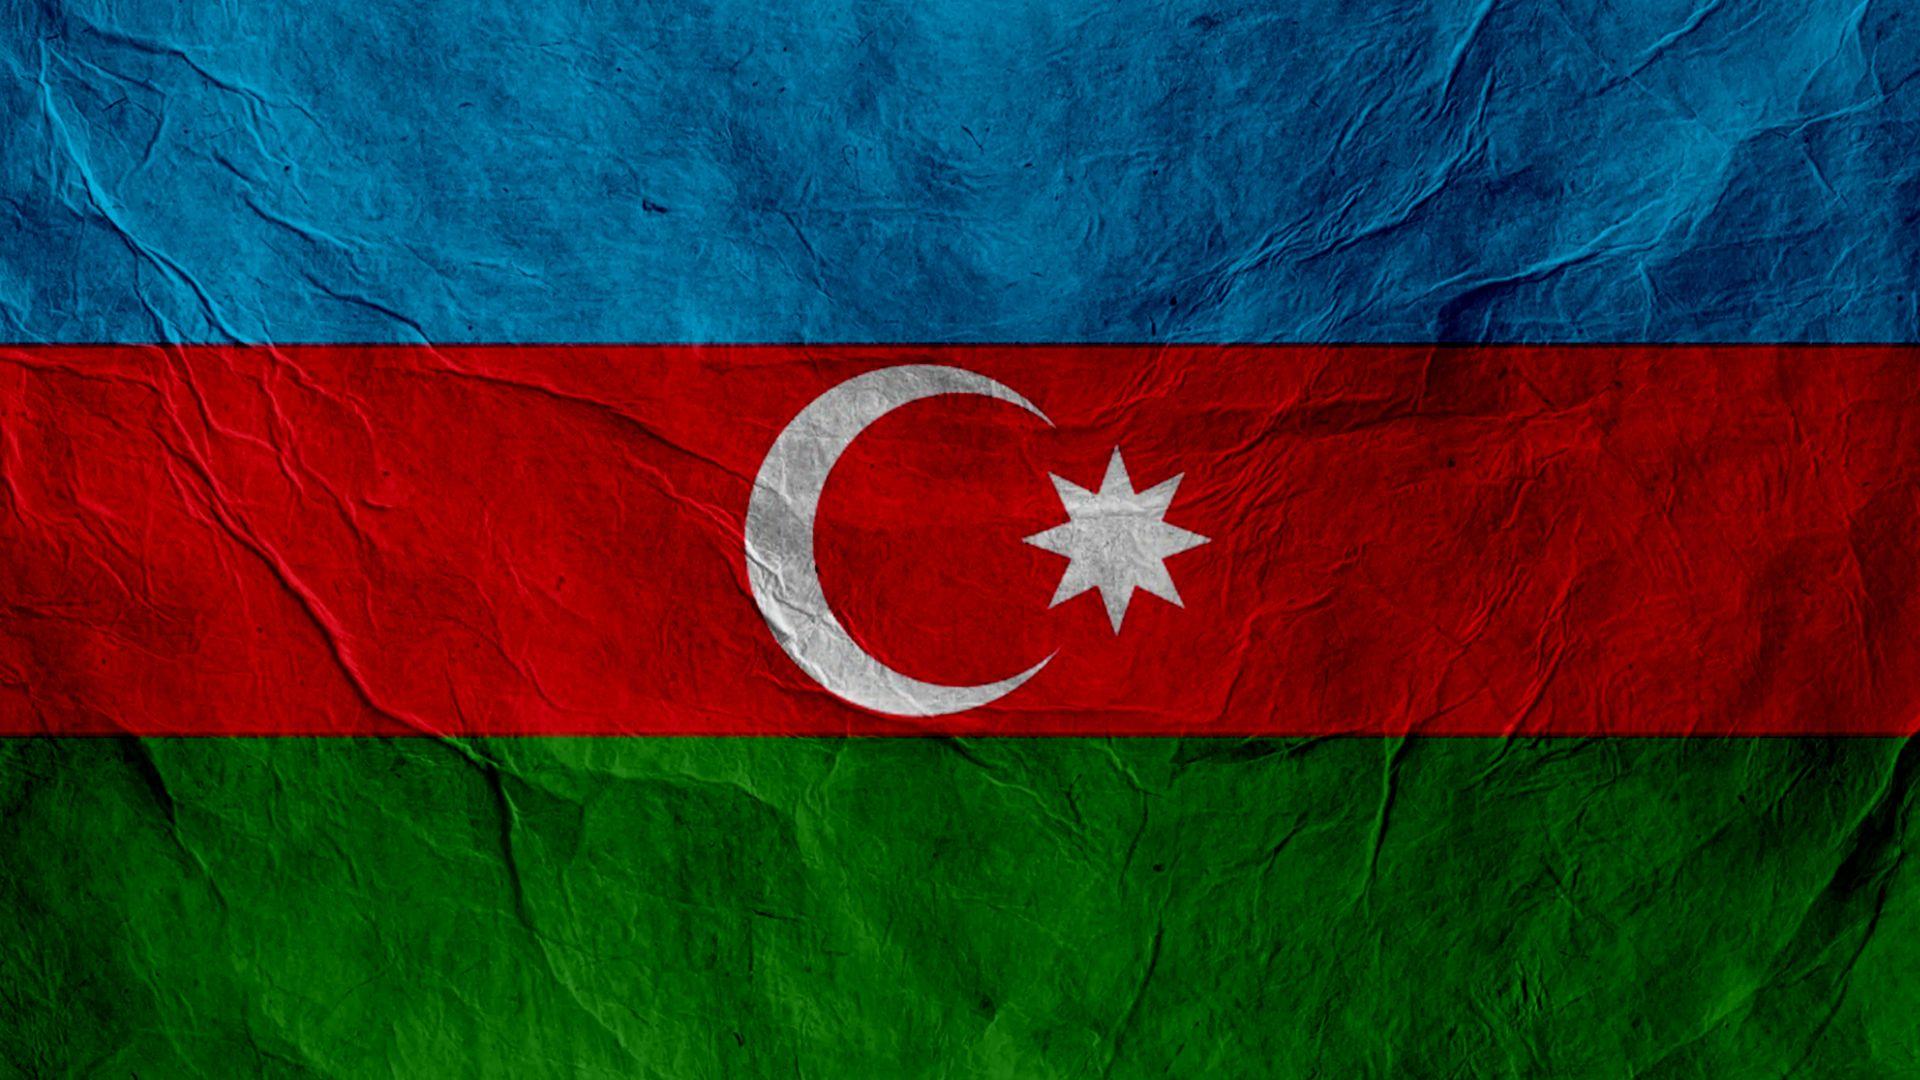 4k Hd Azərbaycan Bayragi Divar Kagizi Azerbaijan Flag Wallpaper Azerbaijan Flag Flag Canada Flag